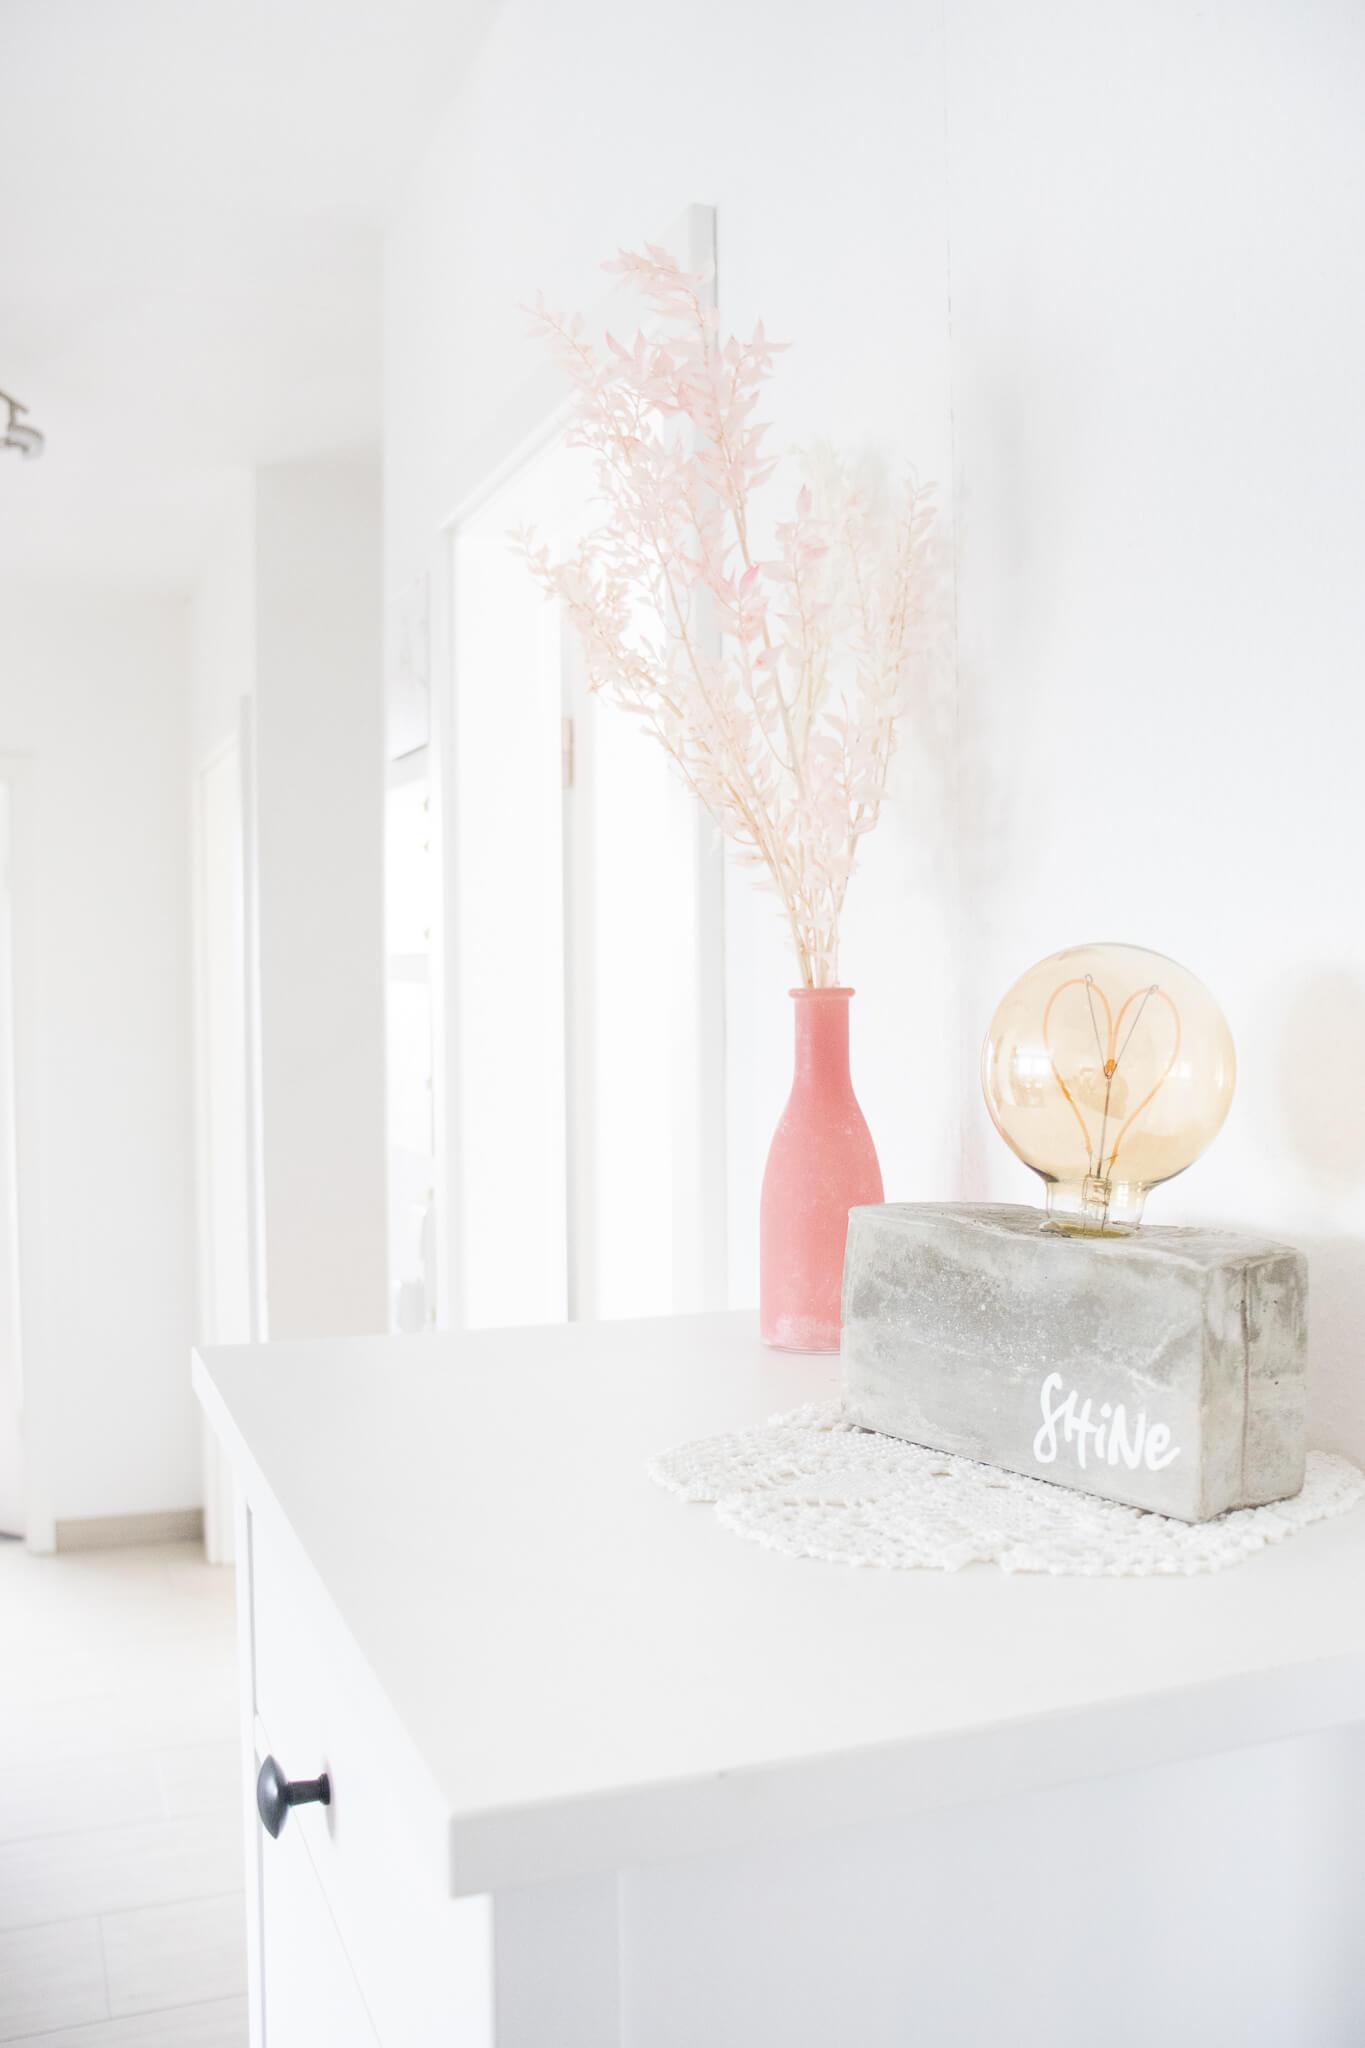 Muttertagsgeschenk-selbstgemacht-Herzlampe-beton